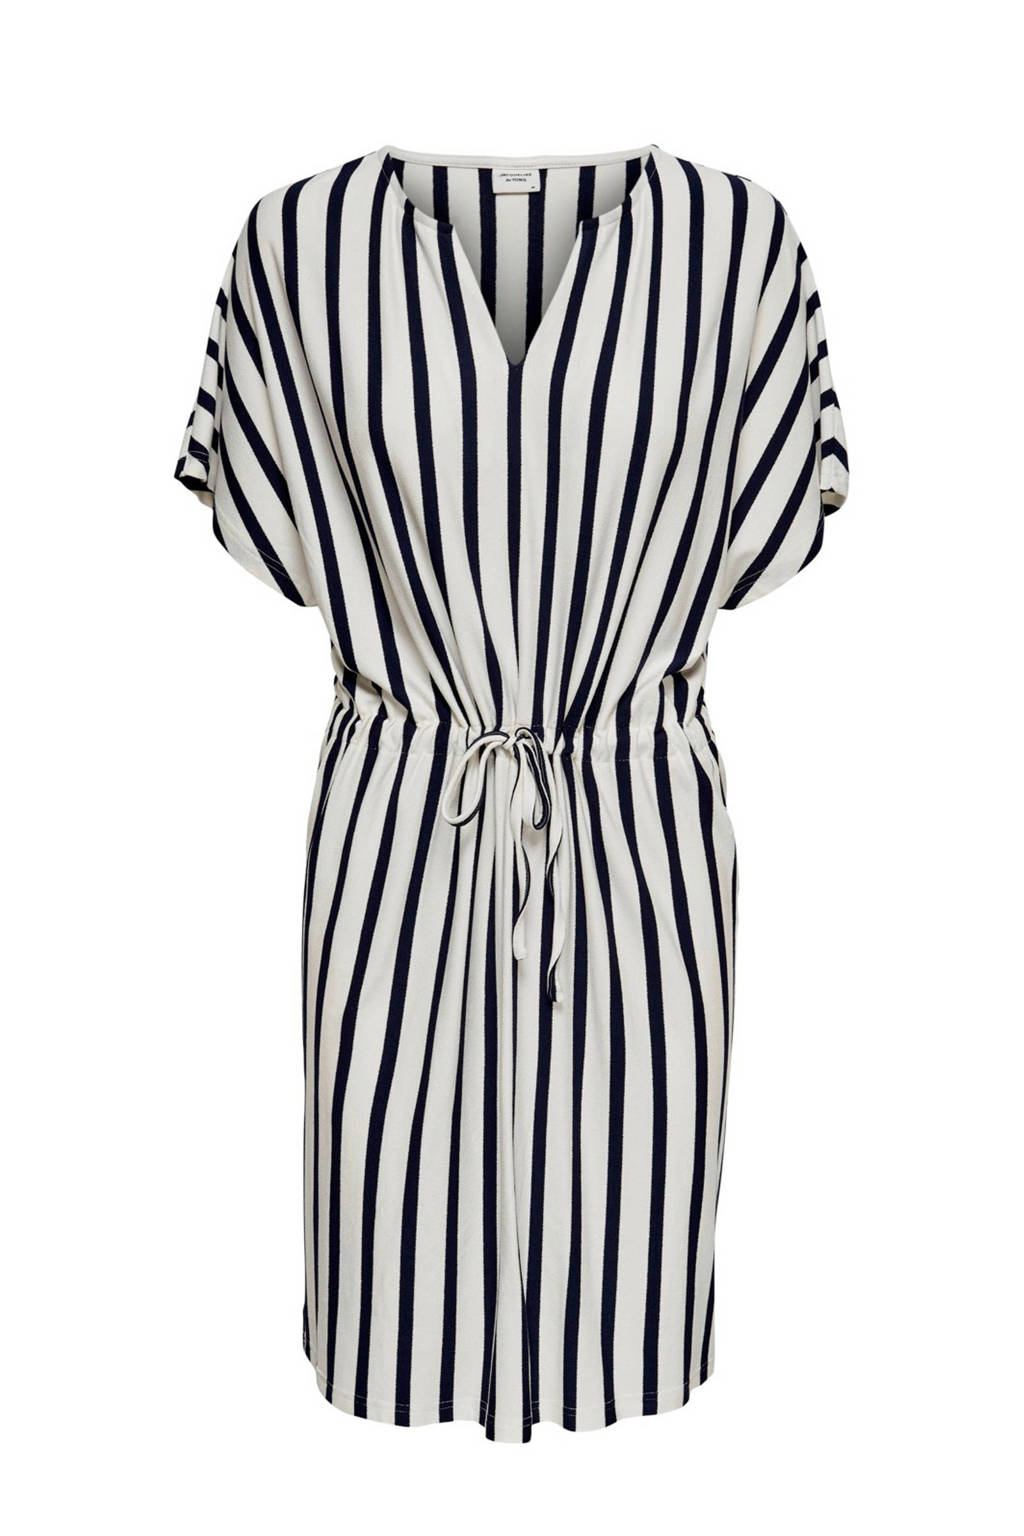 JACQUELINE DE YONG jurk met stepen, Wit/ donkerblauw